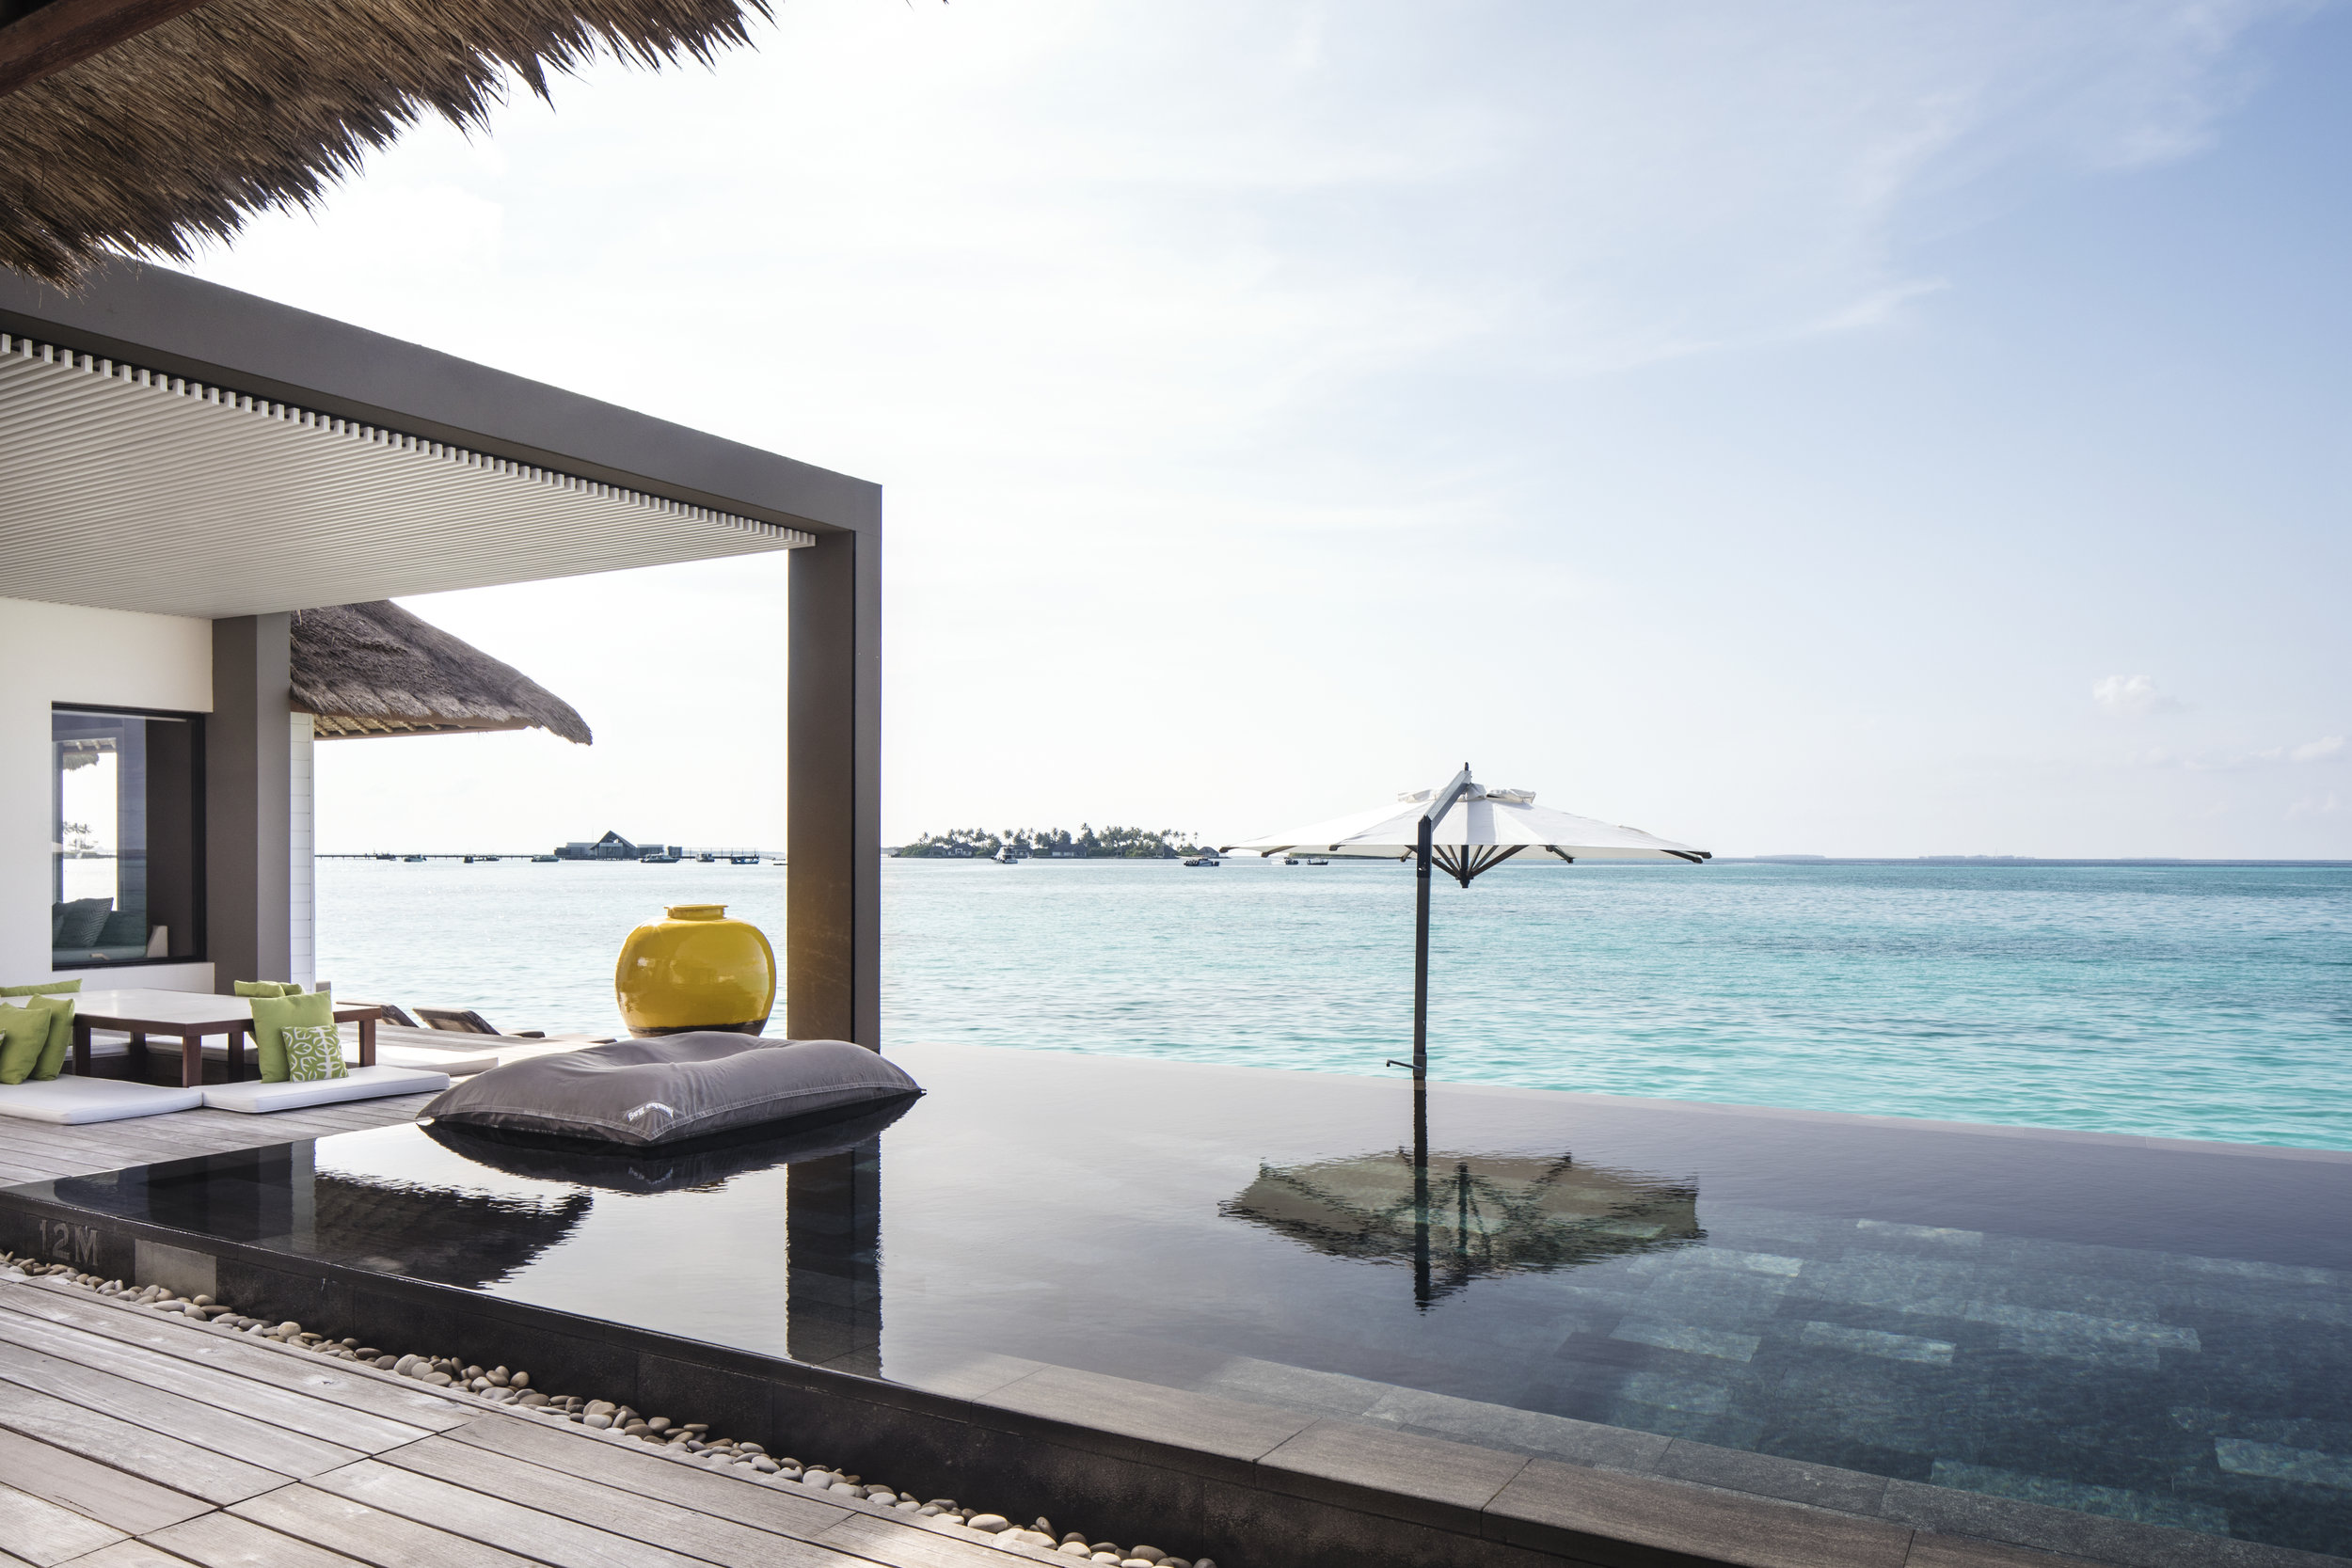 2.2 2bedroom lagoon garden villa - terrace - S.Candito 1151_130_RVB.jpg